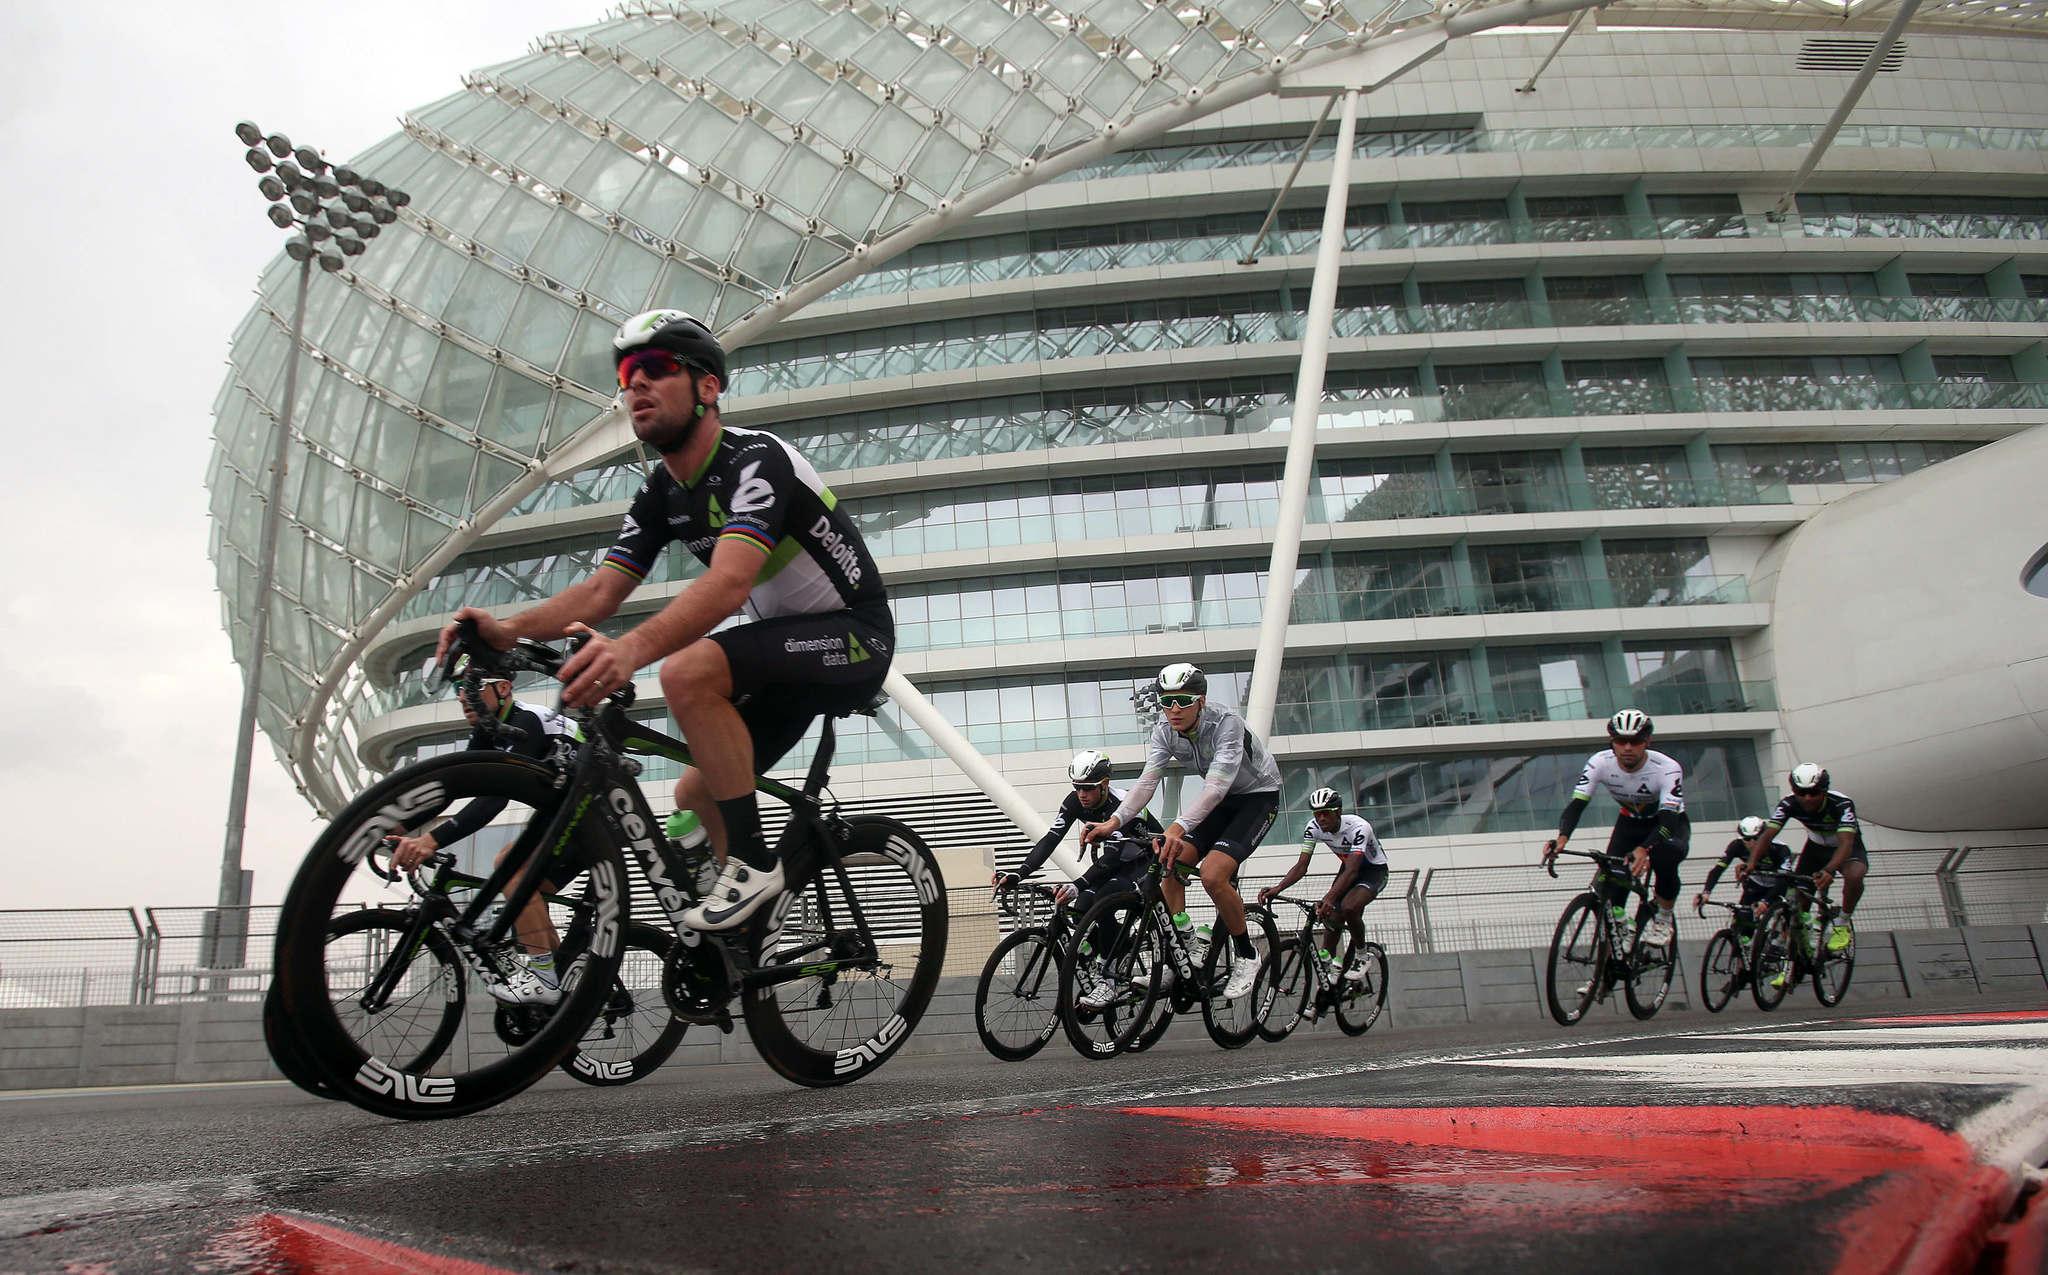 Circuito Yas Marina : Como bólidos en yas marina la tercera edición del abu dhabi tour